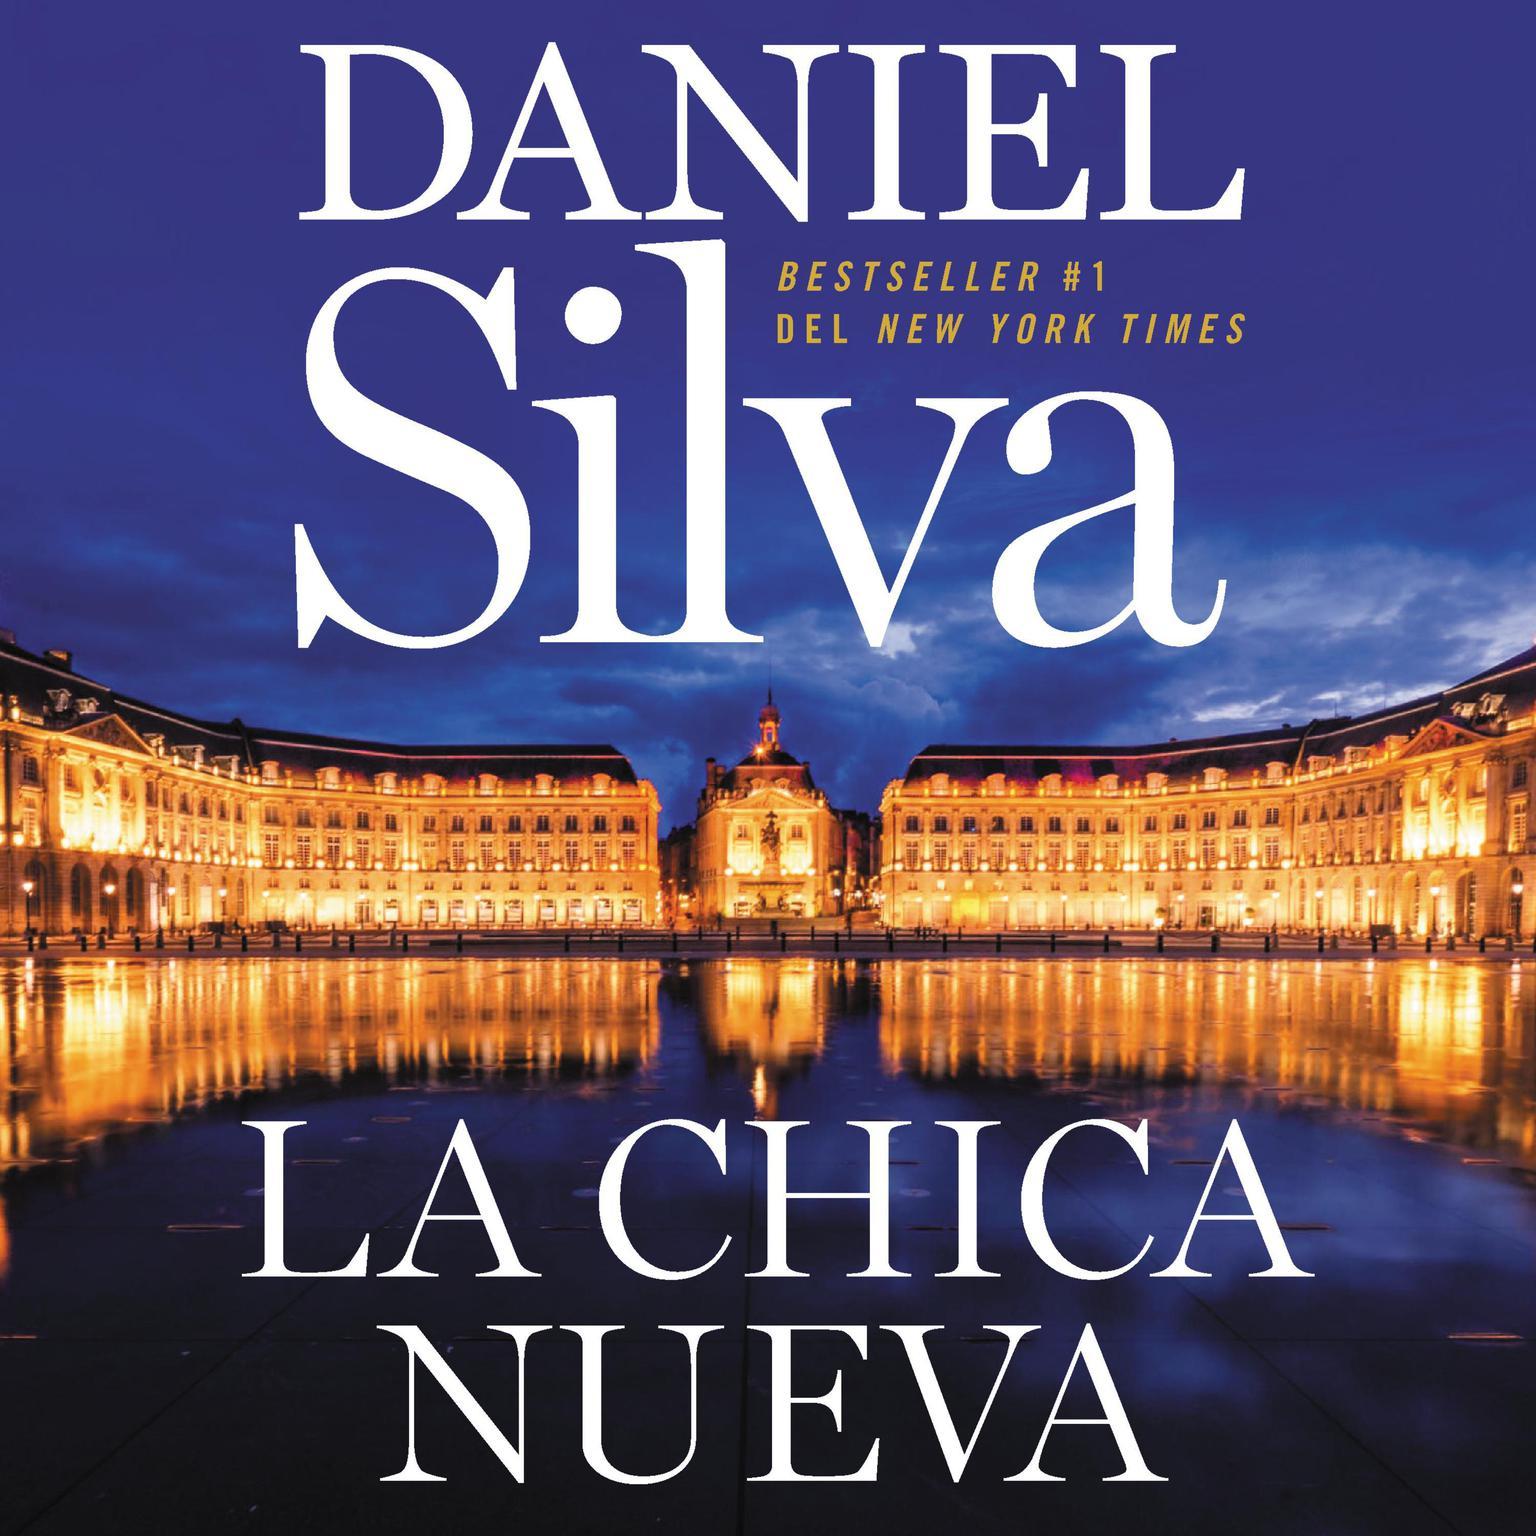 New Girl, The chica nueva, La (Spanish edition) Audiobook, by Daniel Silva